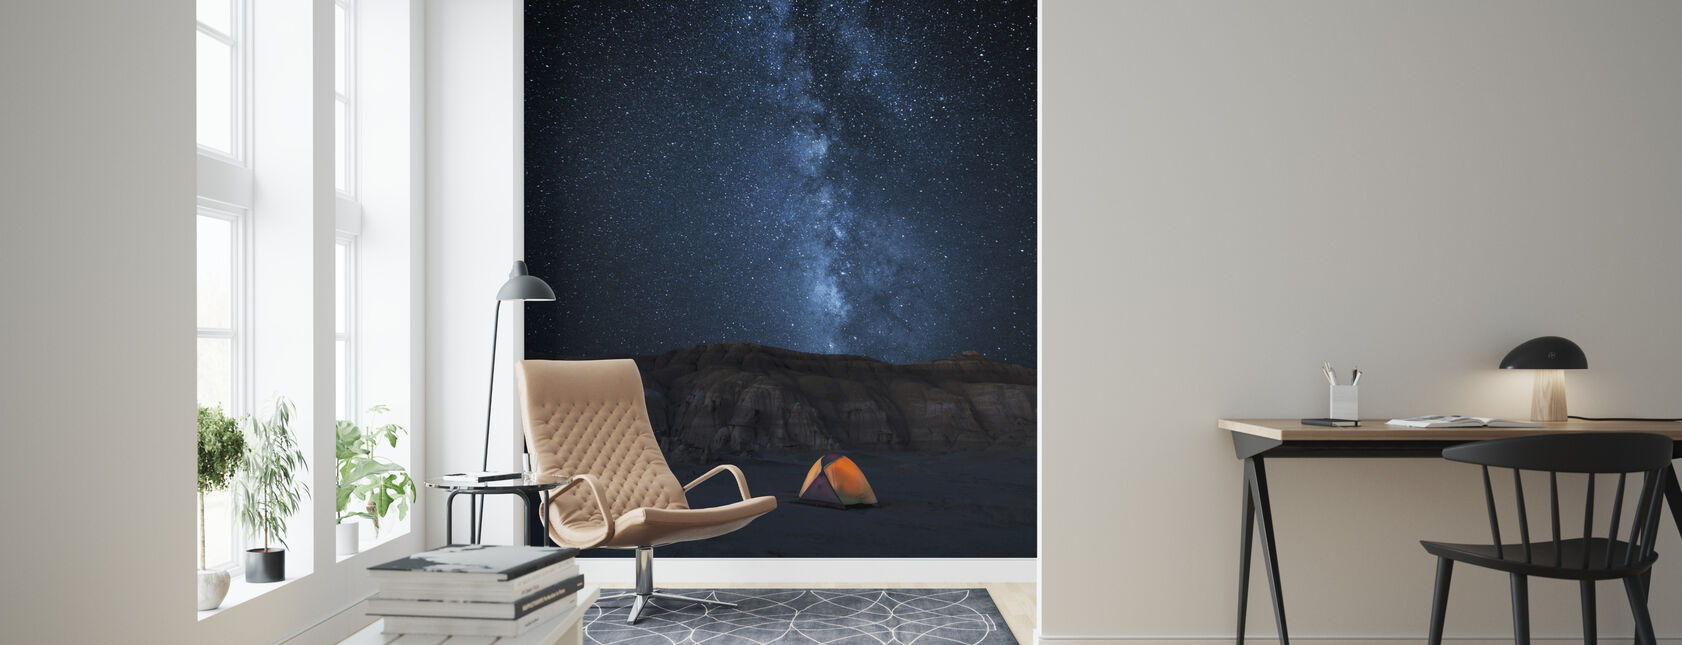 Starry Sky - Wallpaper - Living Room